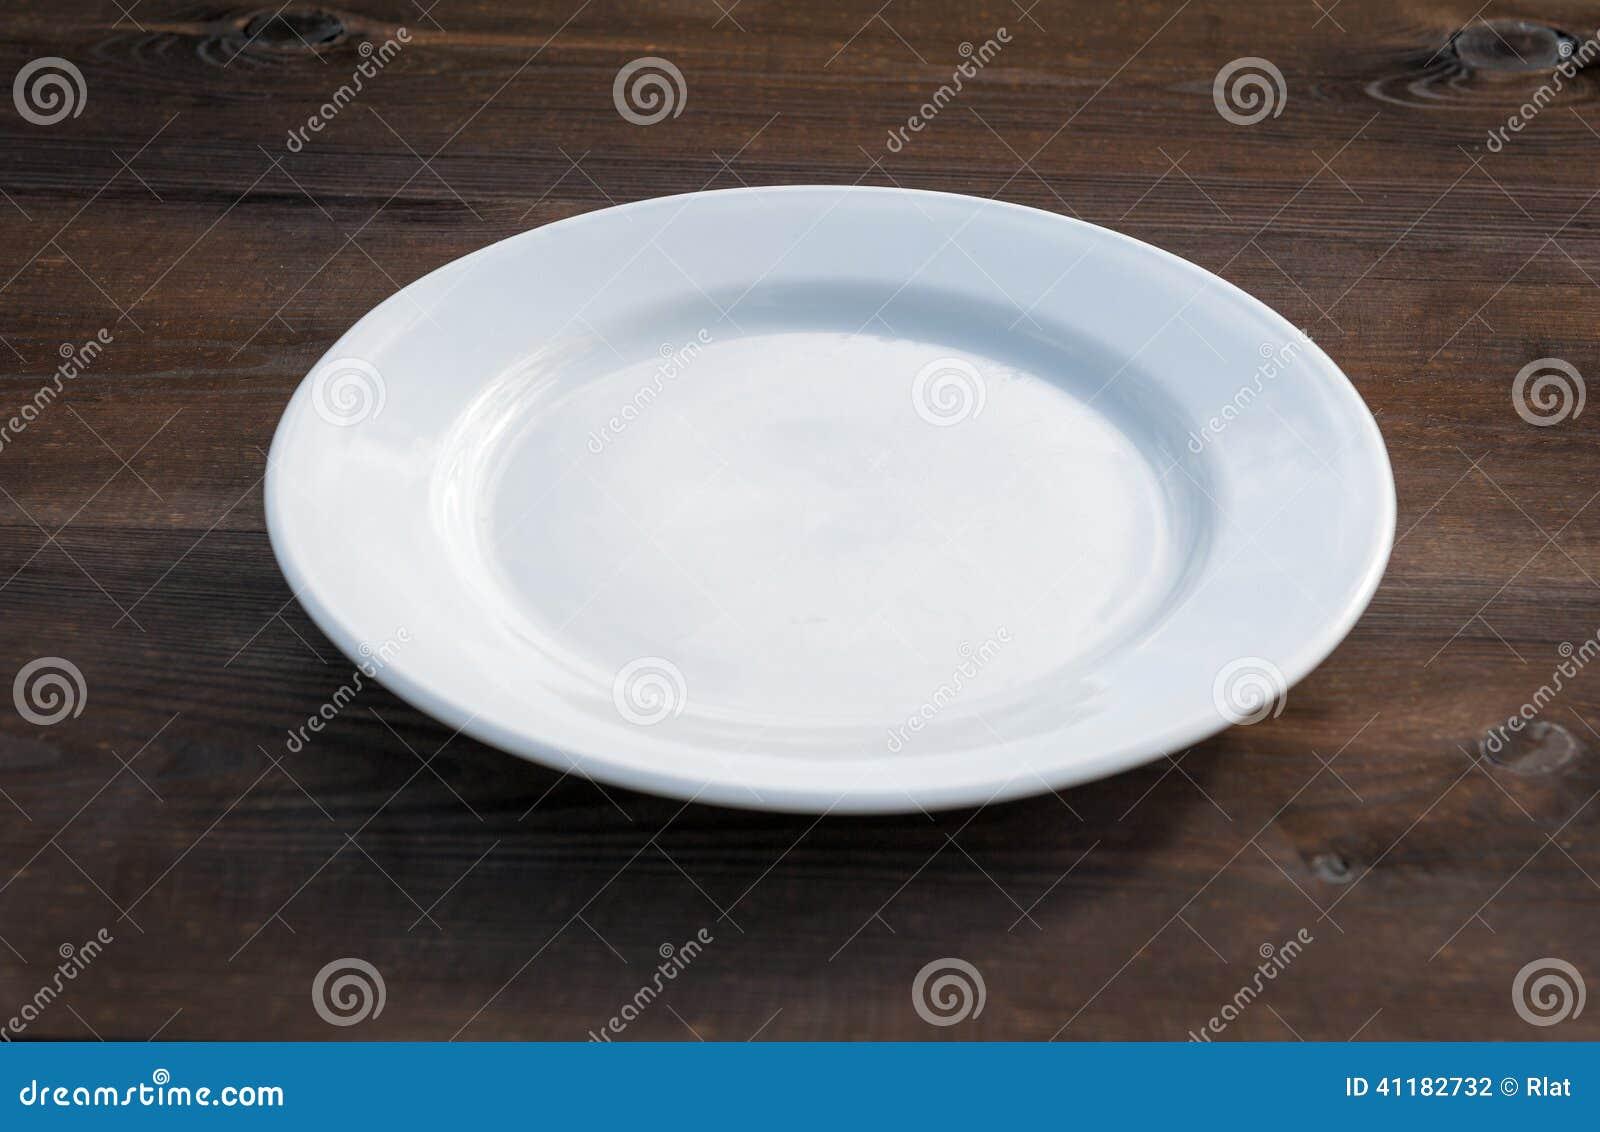 Plate white